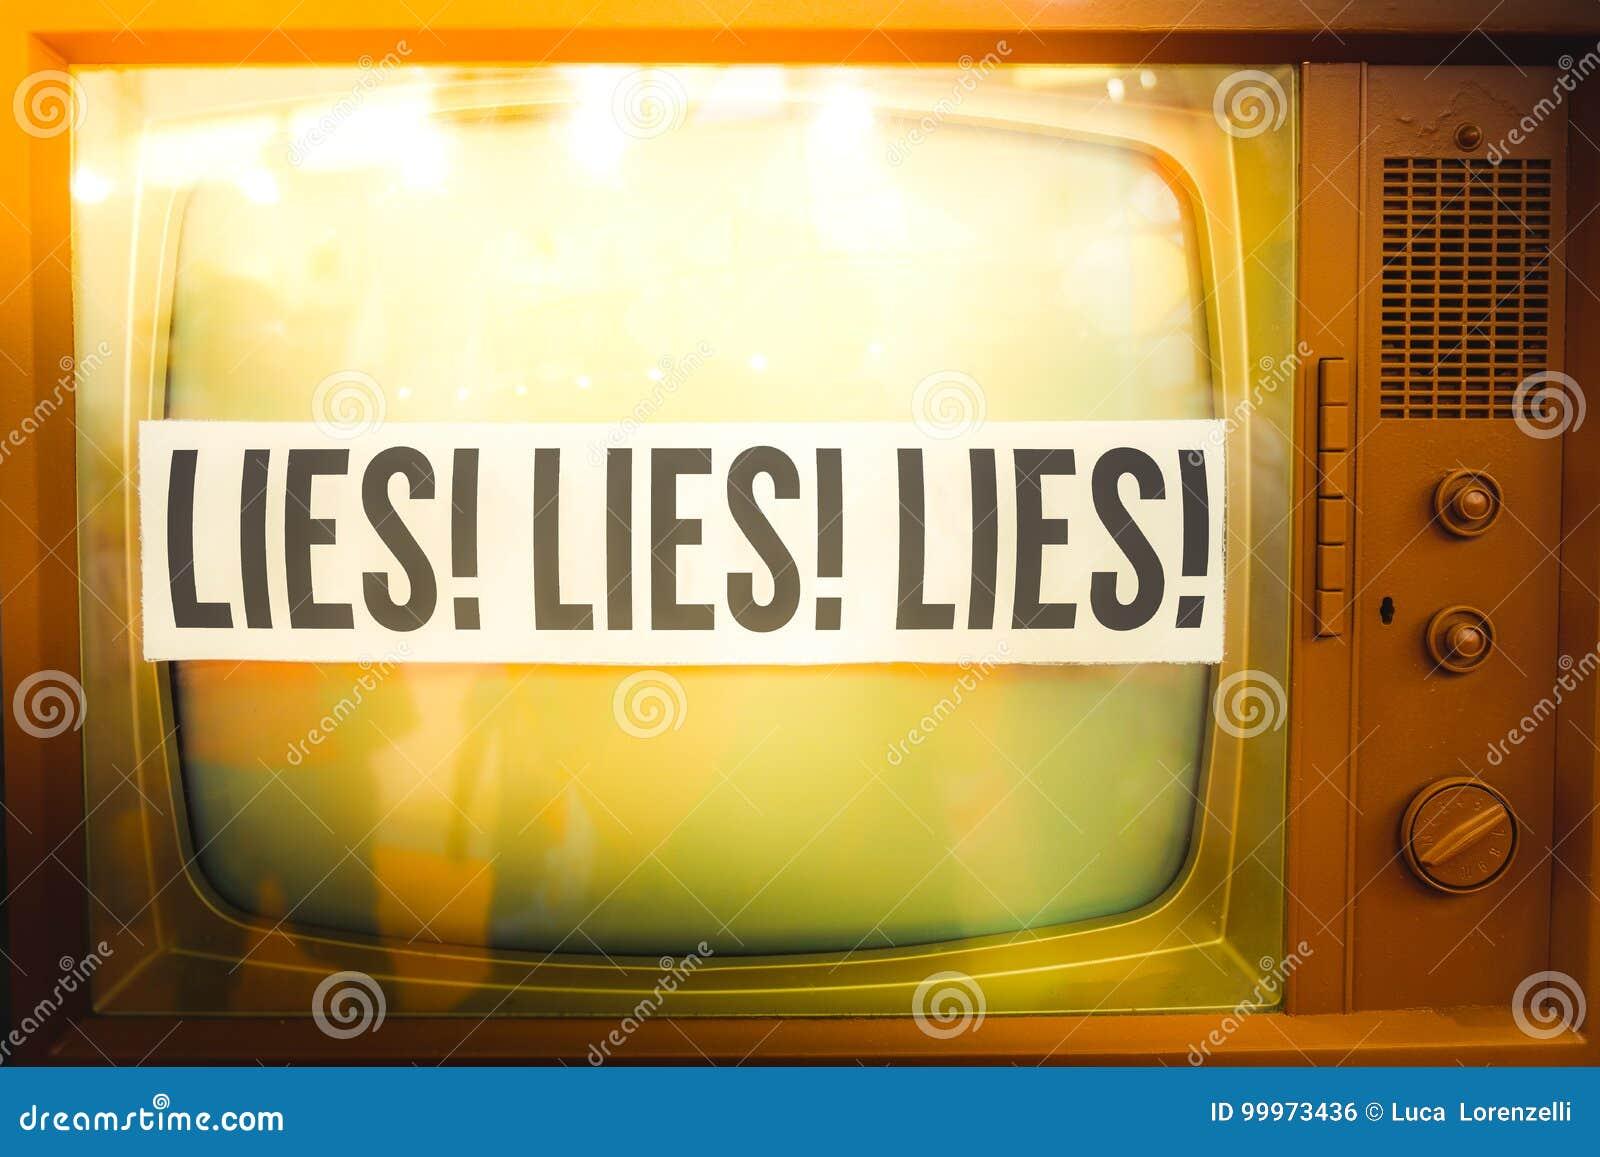 lies of tv propaganda mainstream media disinformation old television label vintage